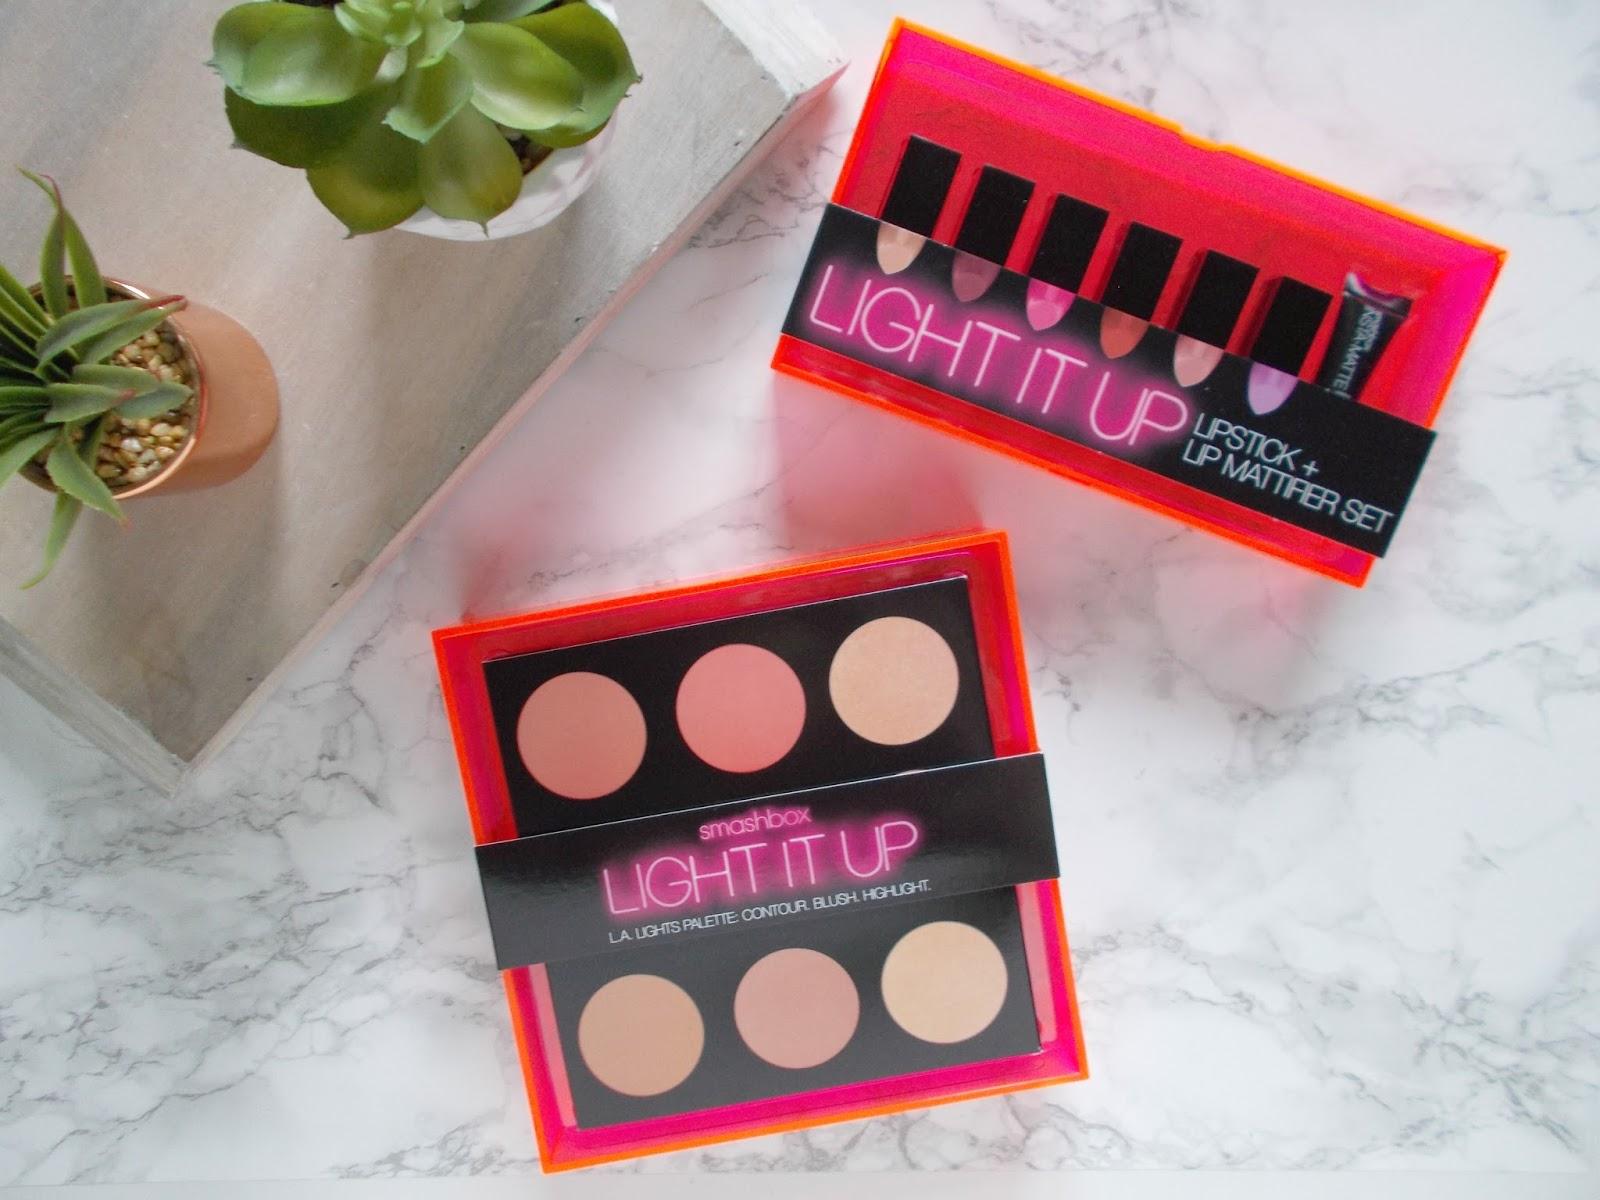 Smashbox Light it Up LA Lights Blush Mega palette lipstick and mattifier set review